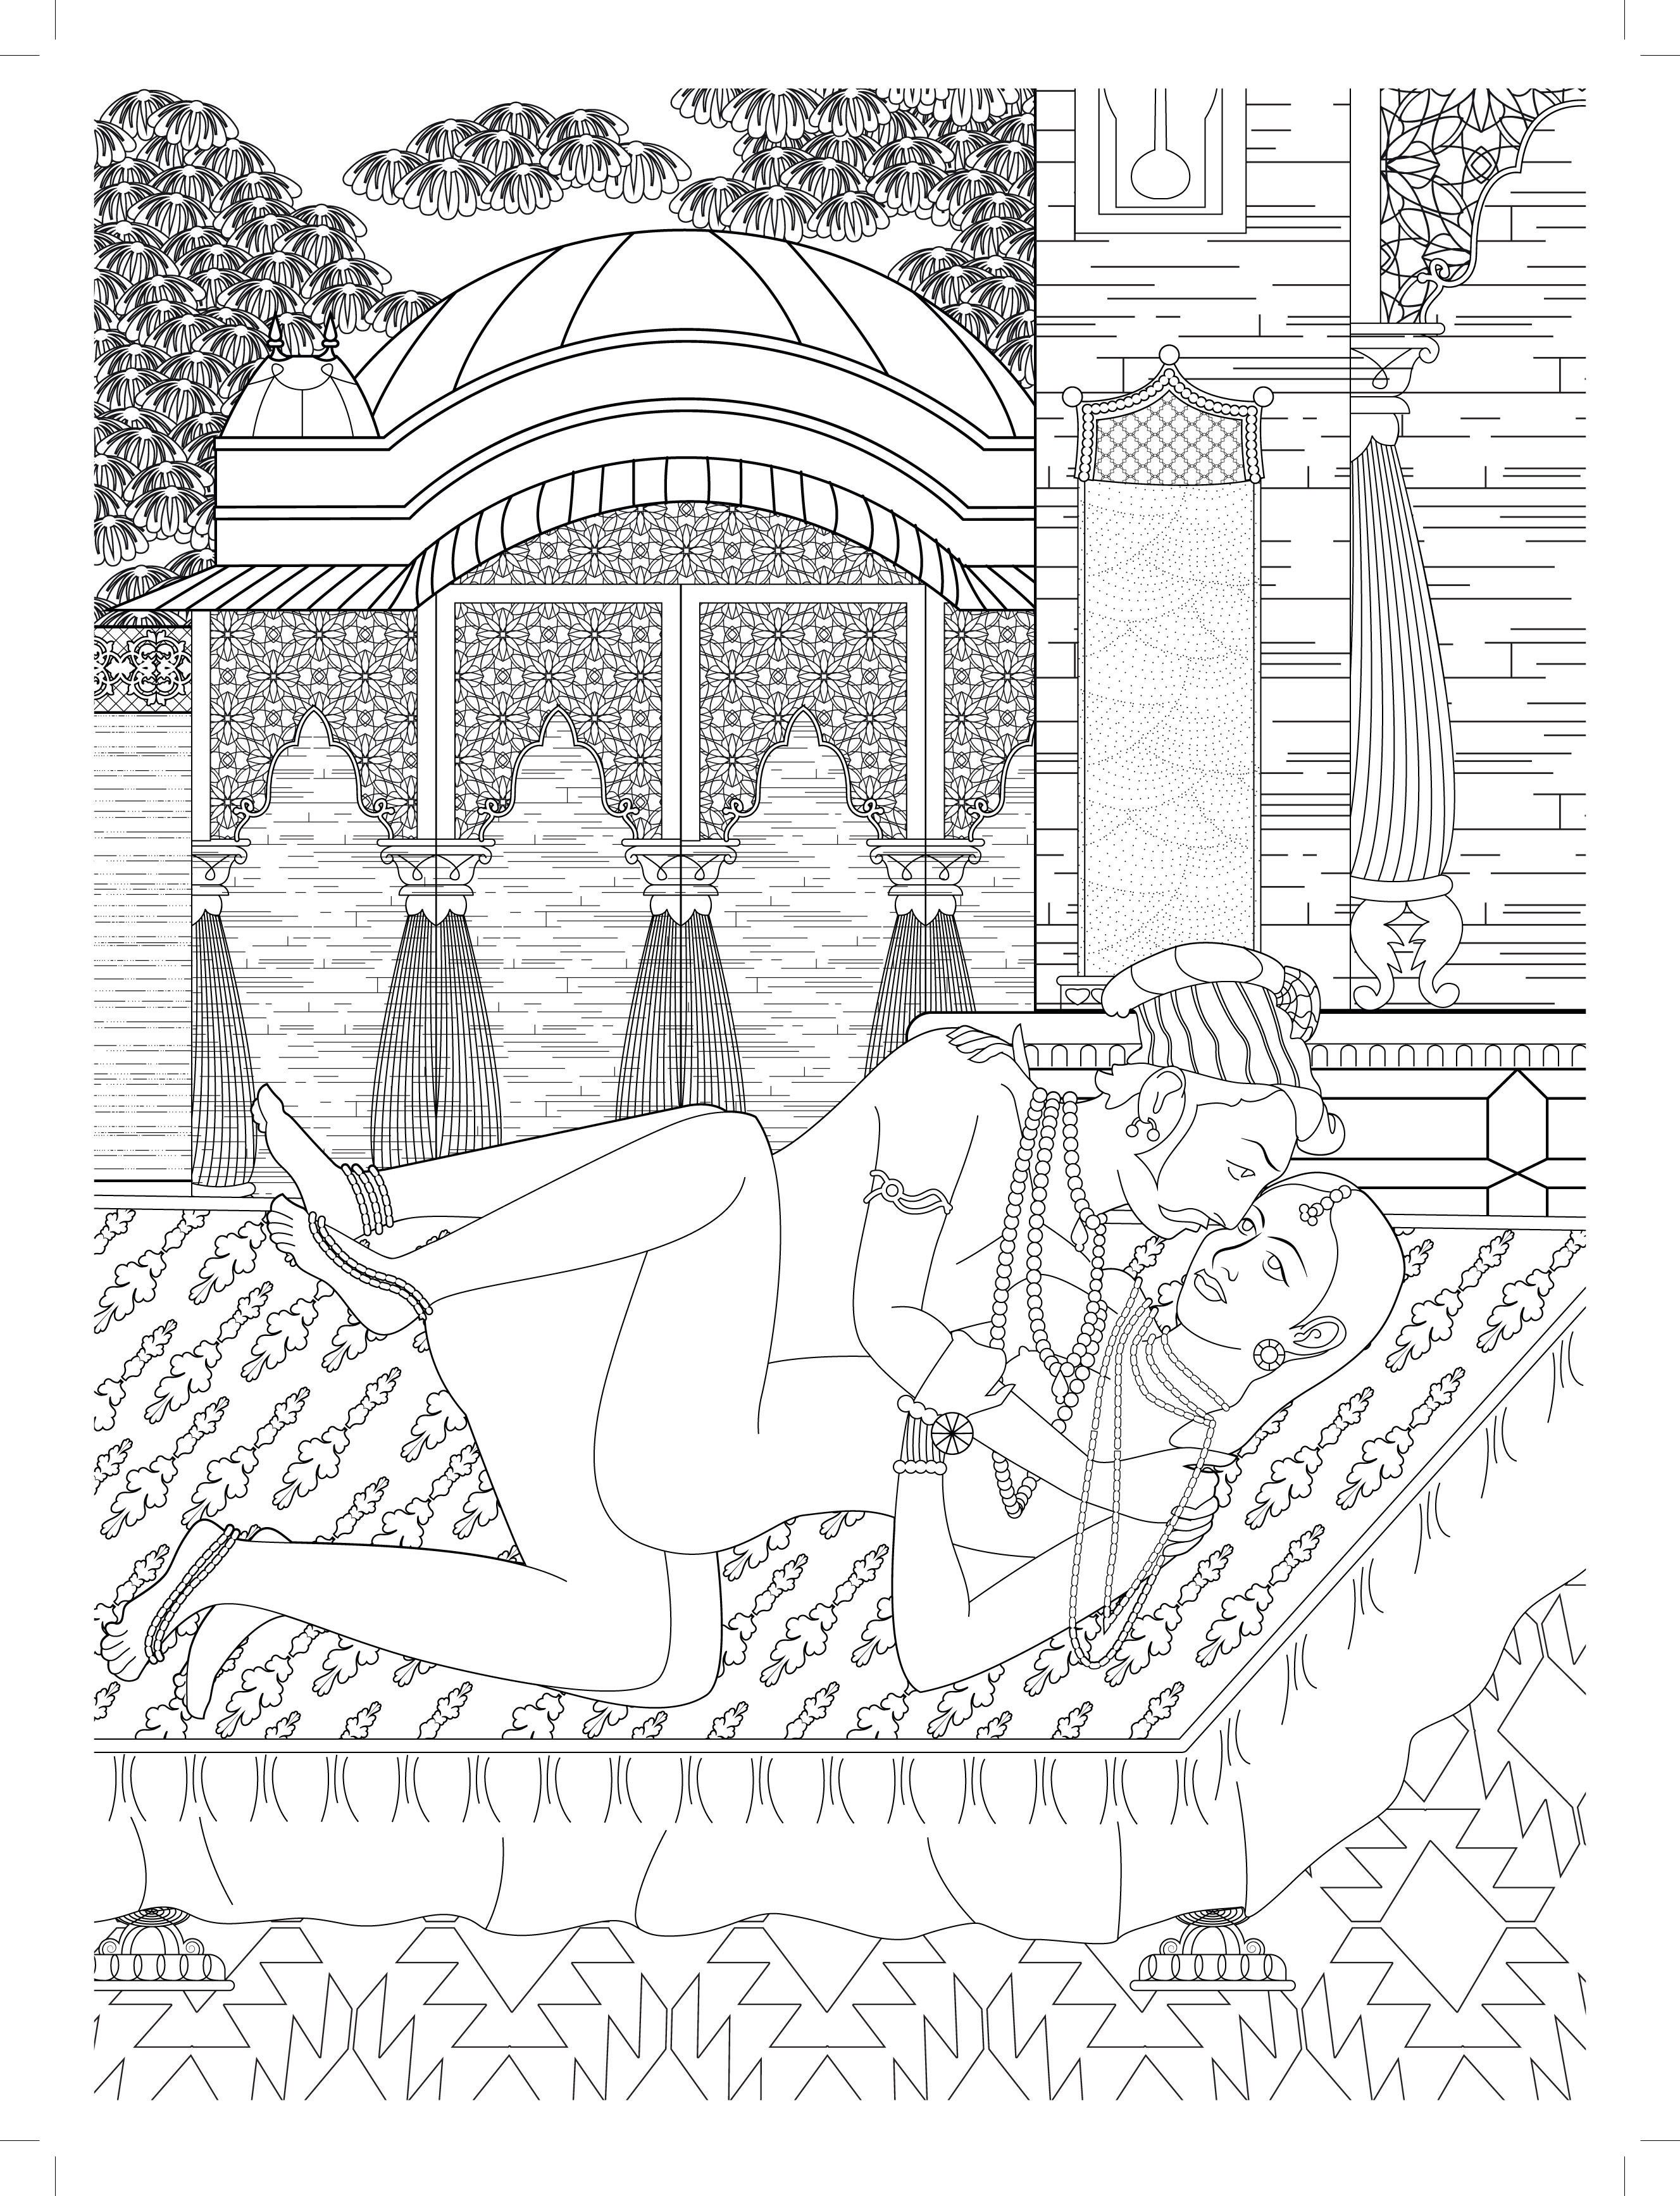 Kamasutra Coloring Book : kamasutra, coloring, Sutra, Colouring, You'll, Clothes, (NSFW), HuffPost